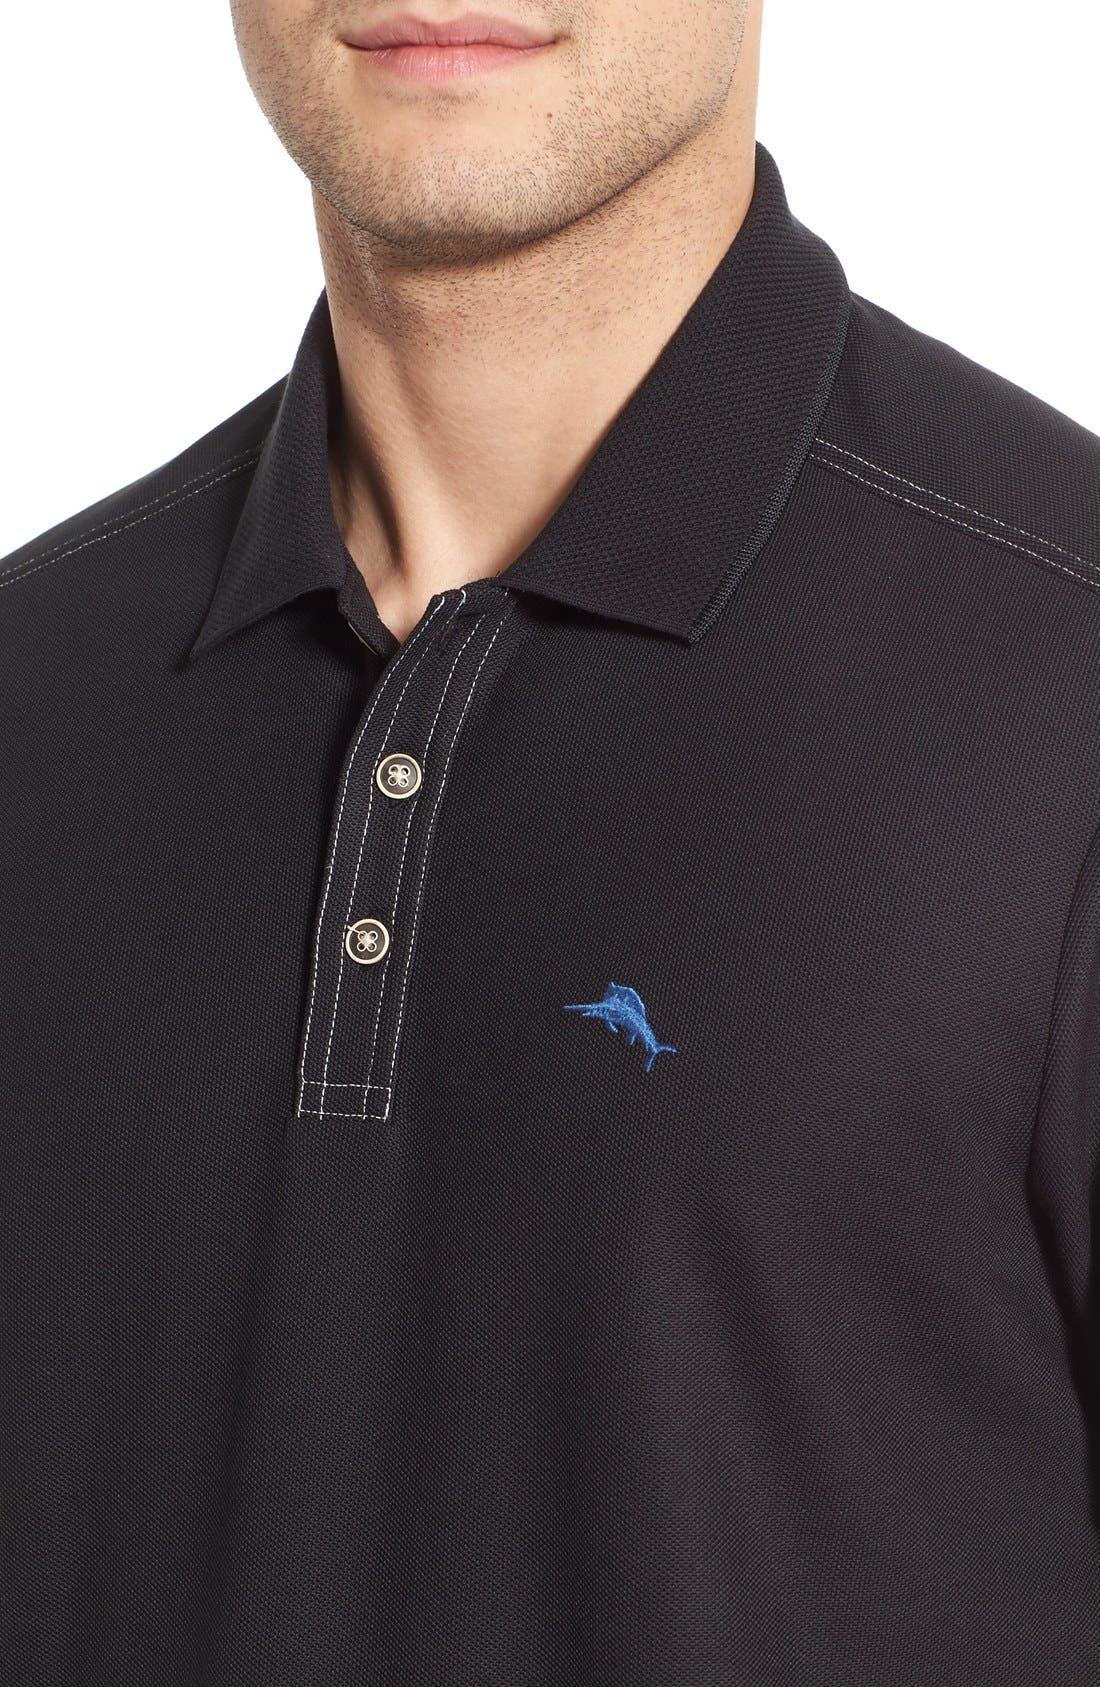 Emfielder Long Sleeve Polo,                             Alternate thumbnail 40, color,